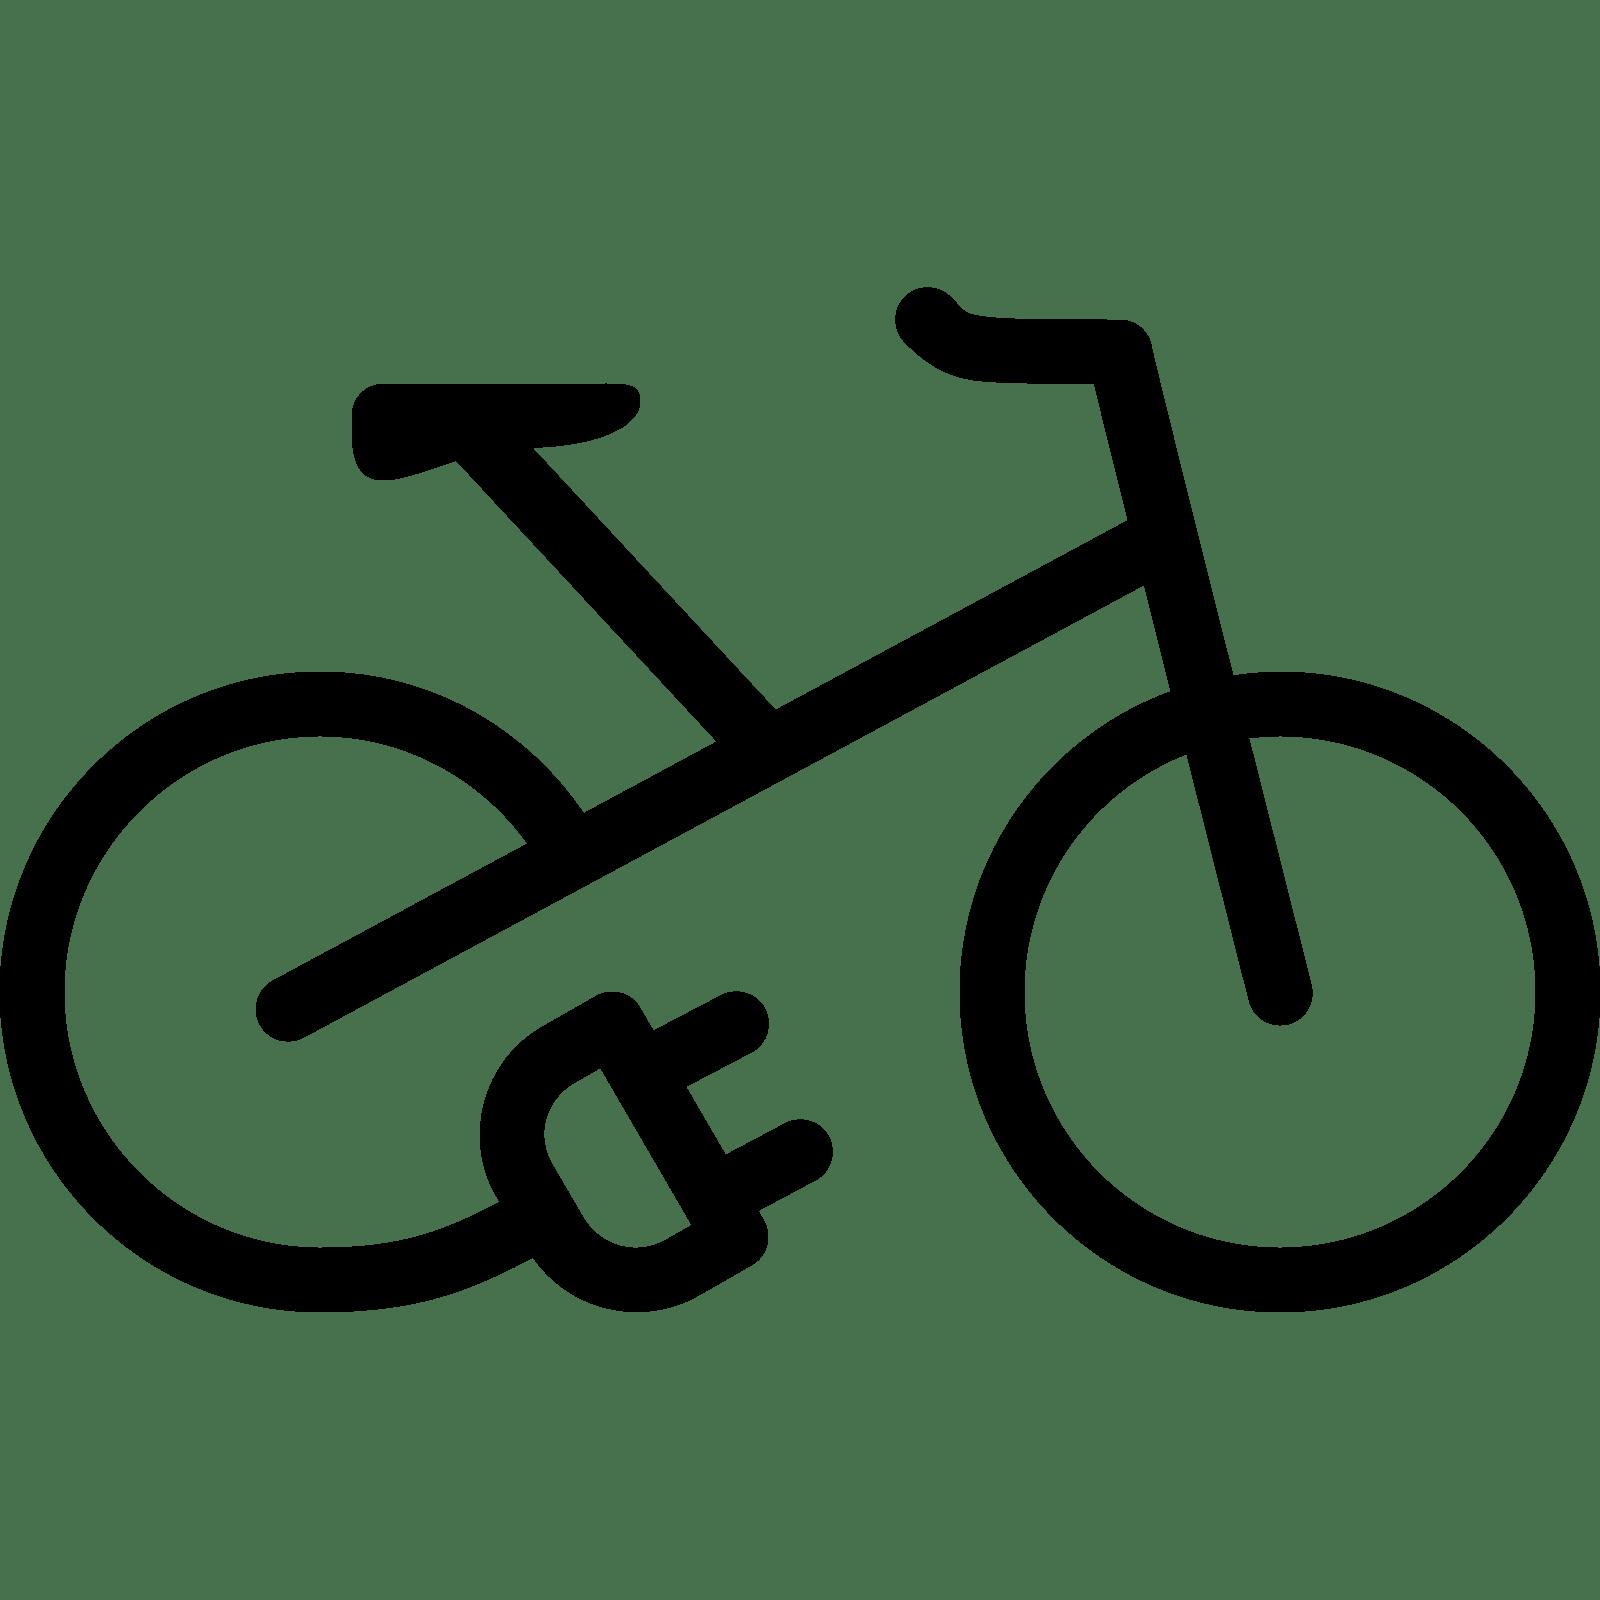 Electric Bike Icon